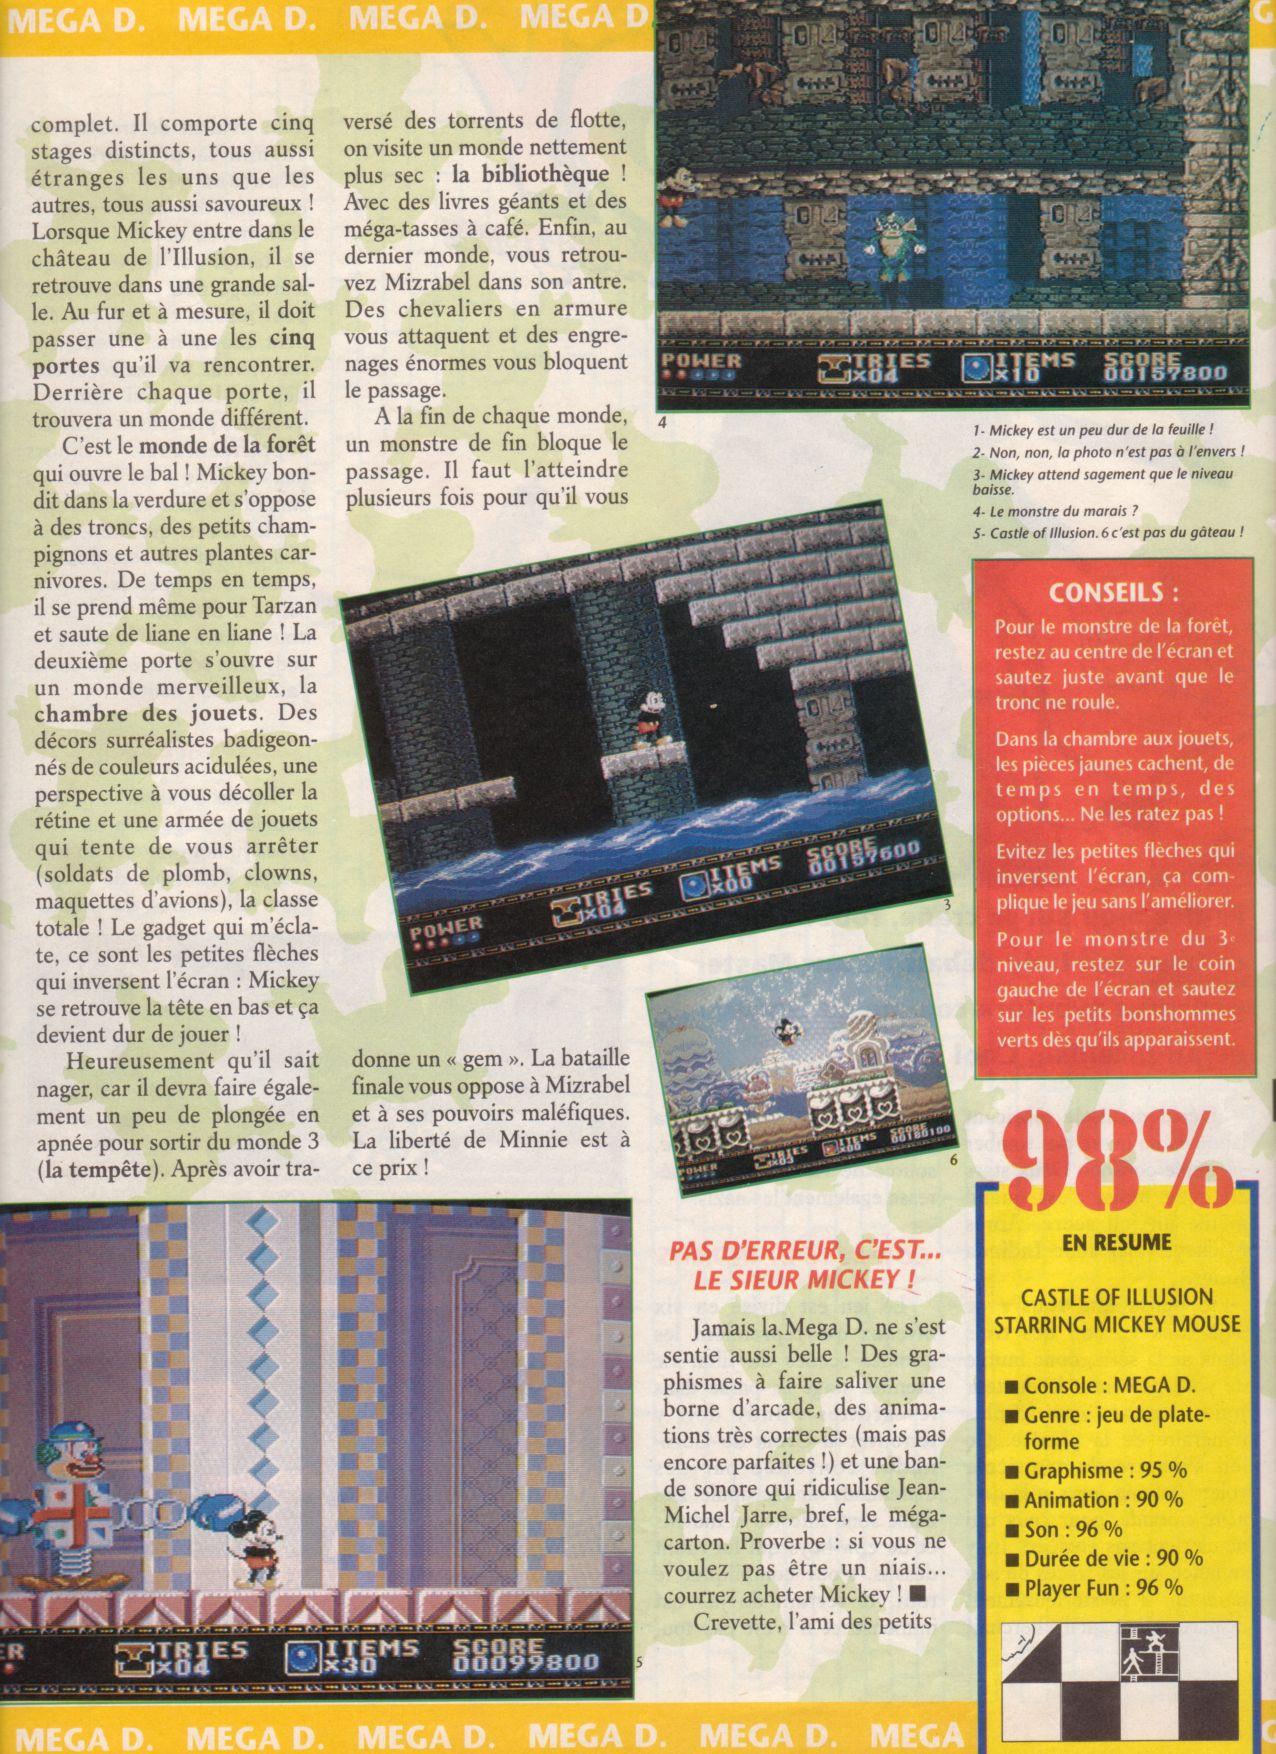 [Jeux]   CASTLE OF ILLUSION (Mega Drive) 1990. Player%20One%20008%20-%20Page%20023%20(1991-04)